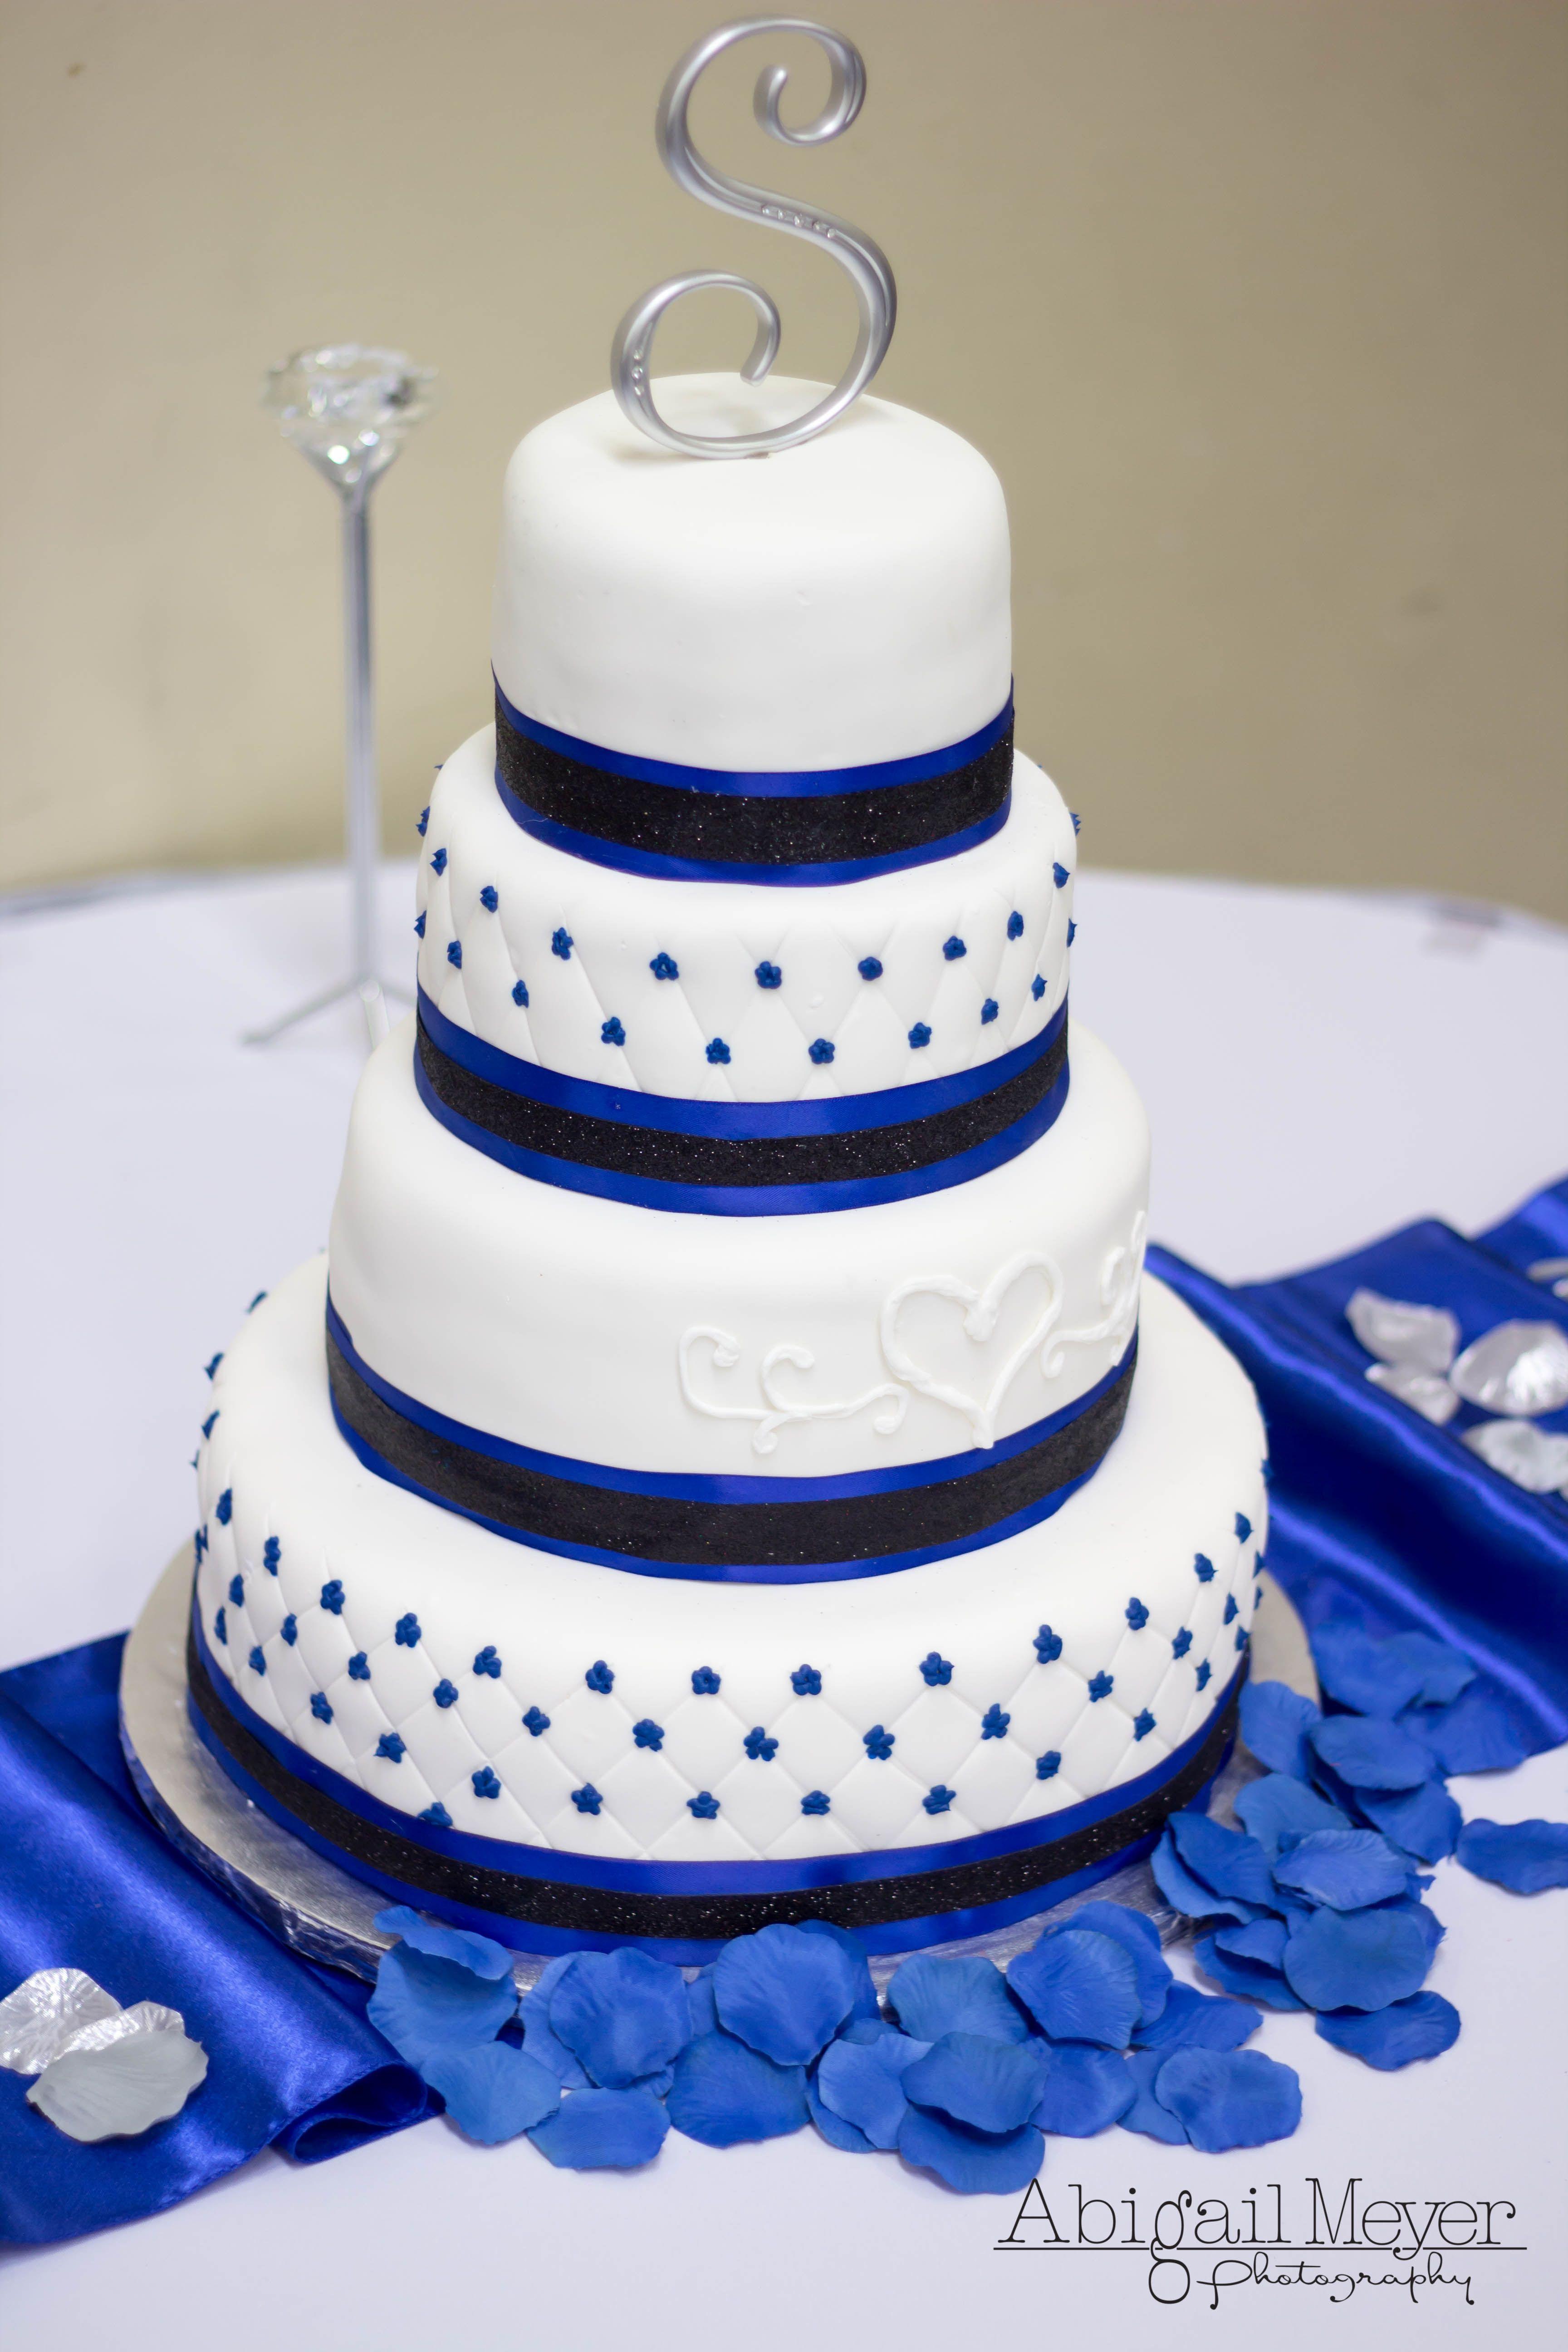 AbigailMeyerPhotography wedding love cake happyday